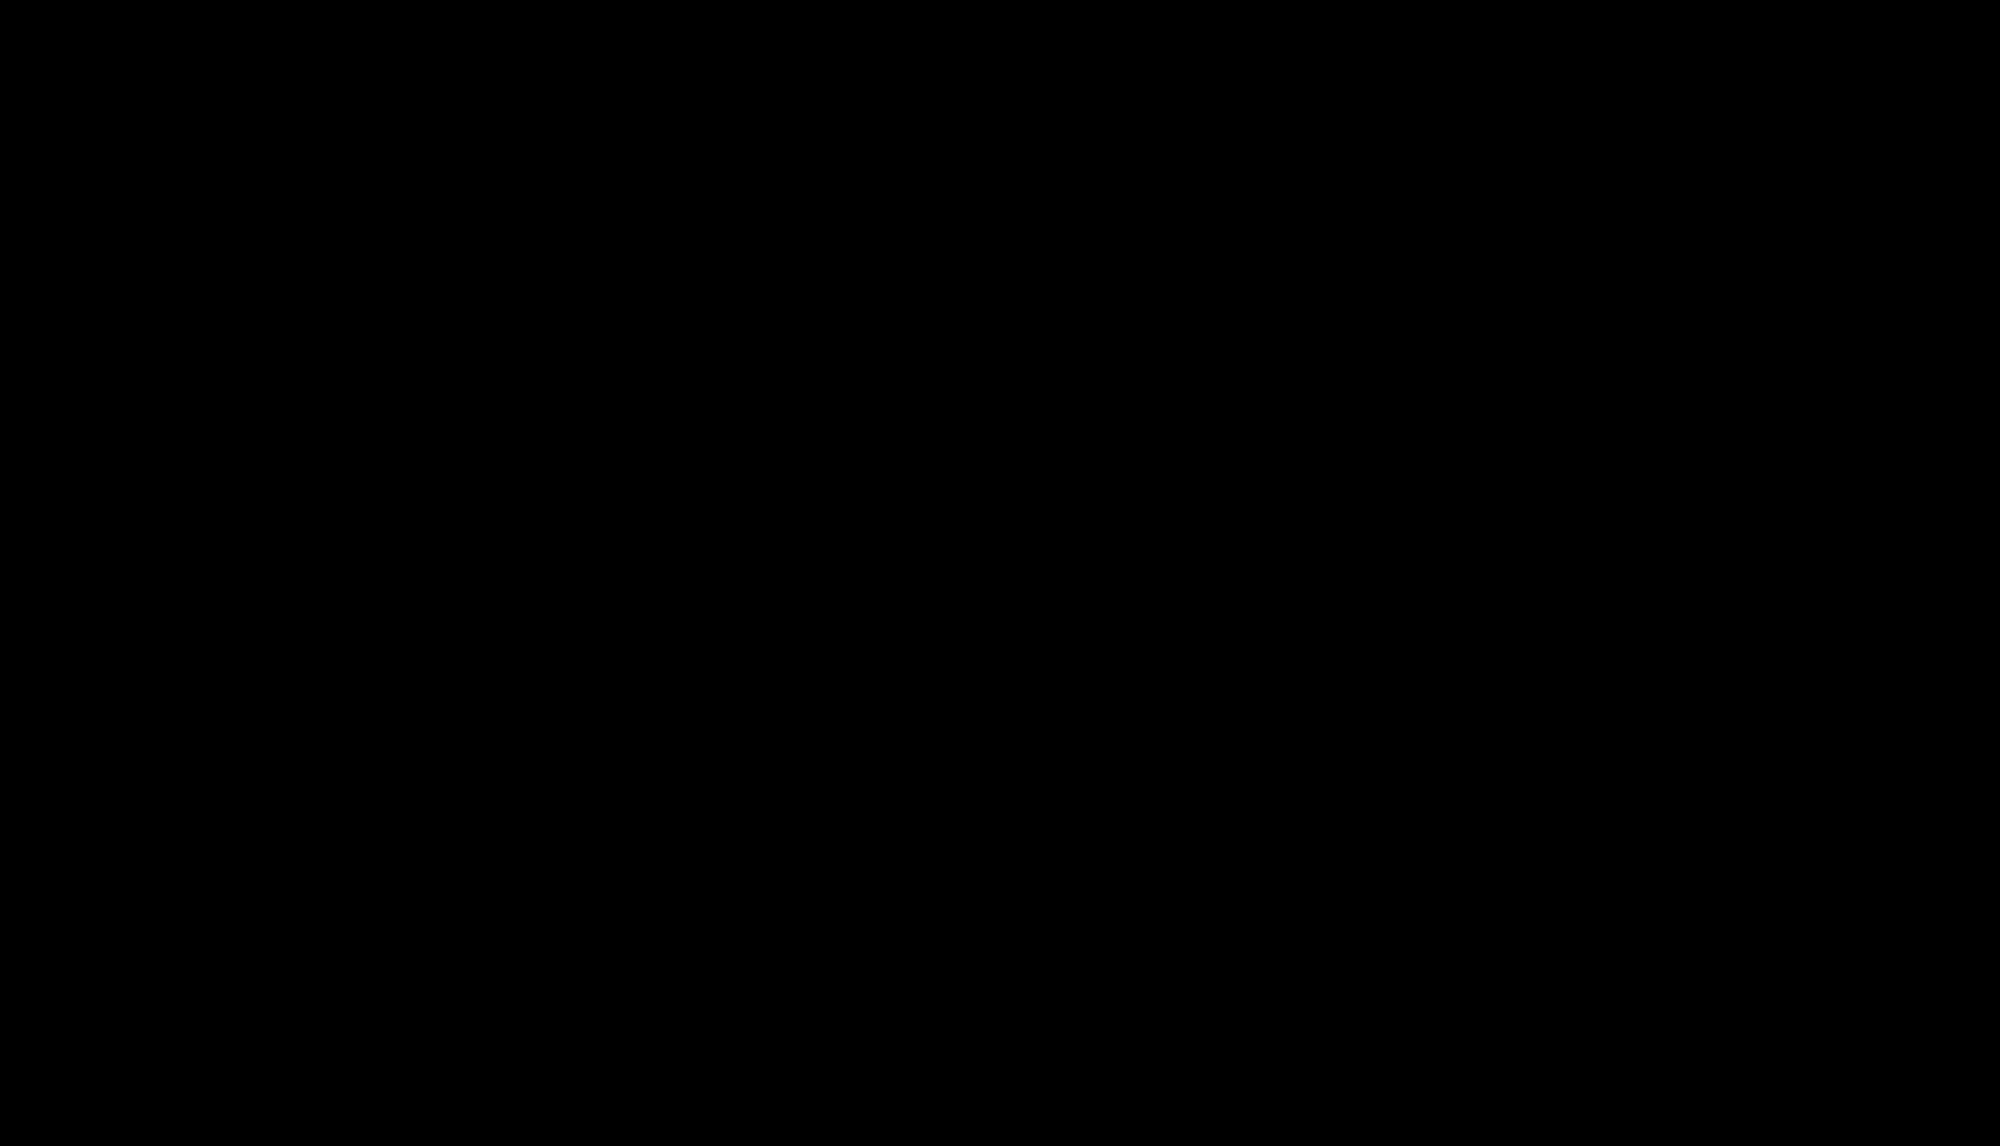 Spike_TV_logo.png